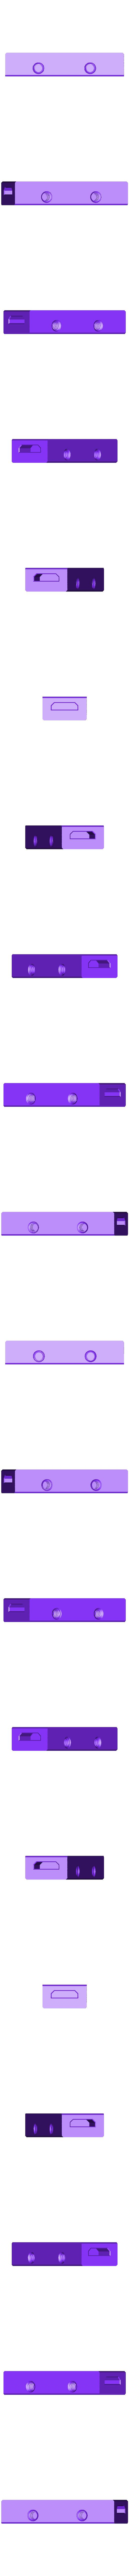 cargo_chassis_bottom.stl Download STL file Toy train construction set - whole train combo • 3D print object, kozakm